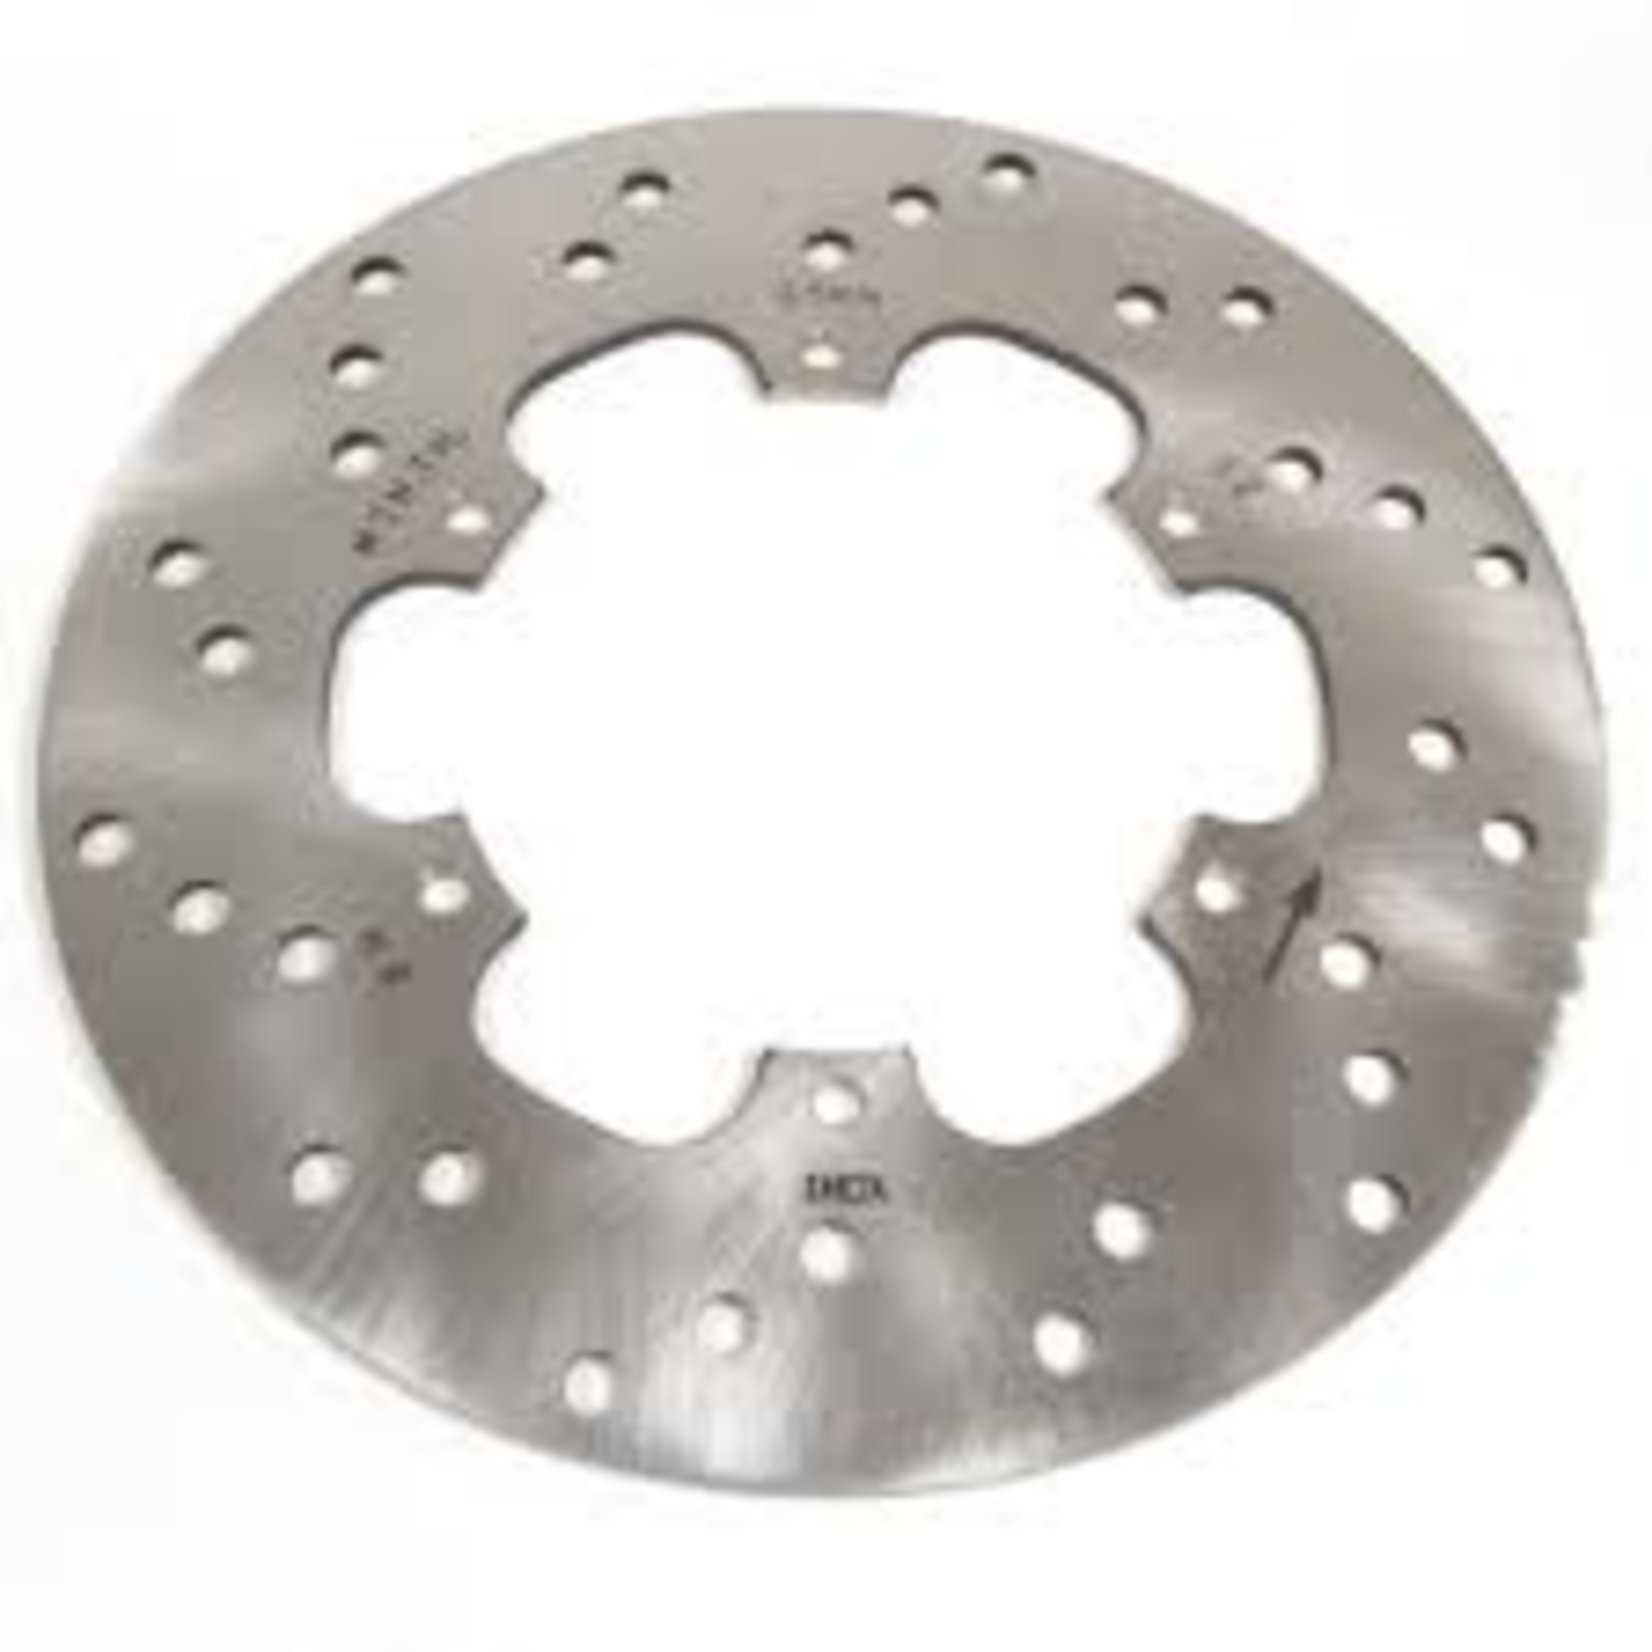 Parts Brake Rotor, GT/GTS FT & RR (56484R)